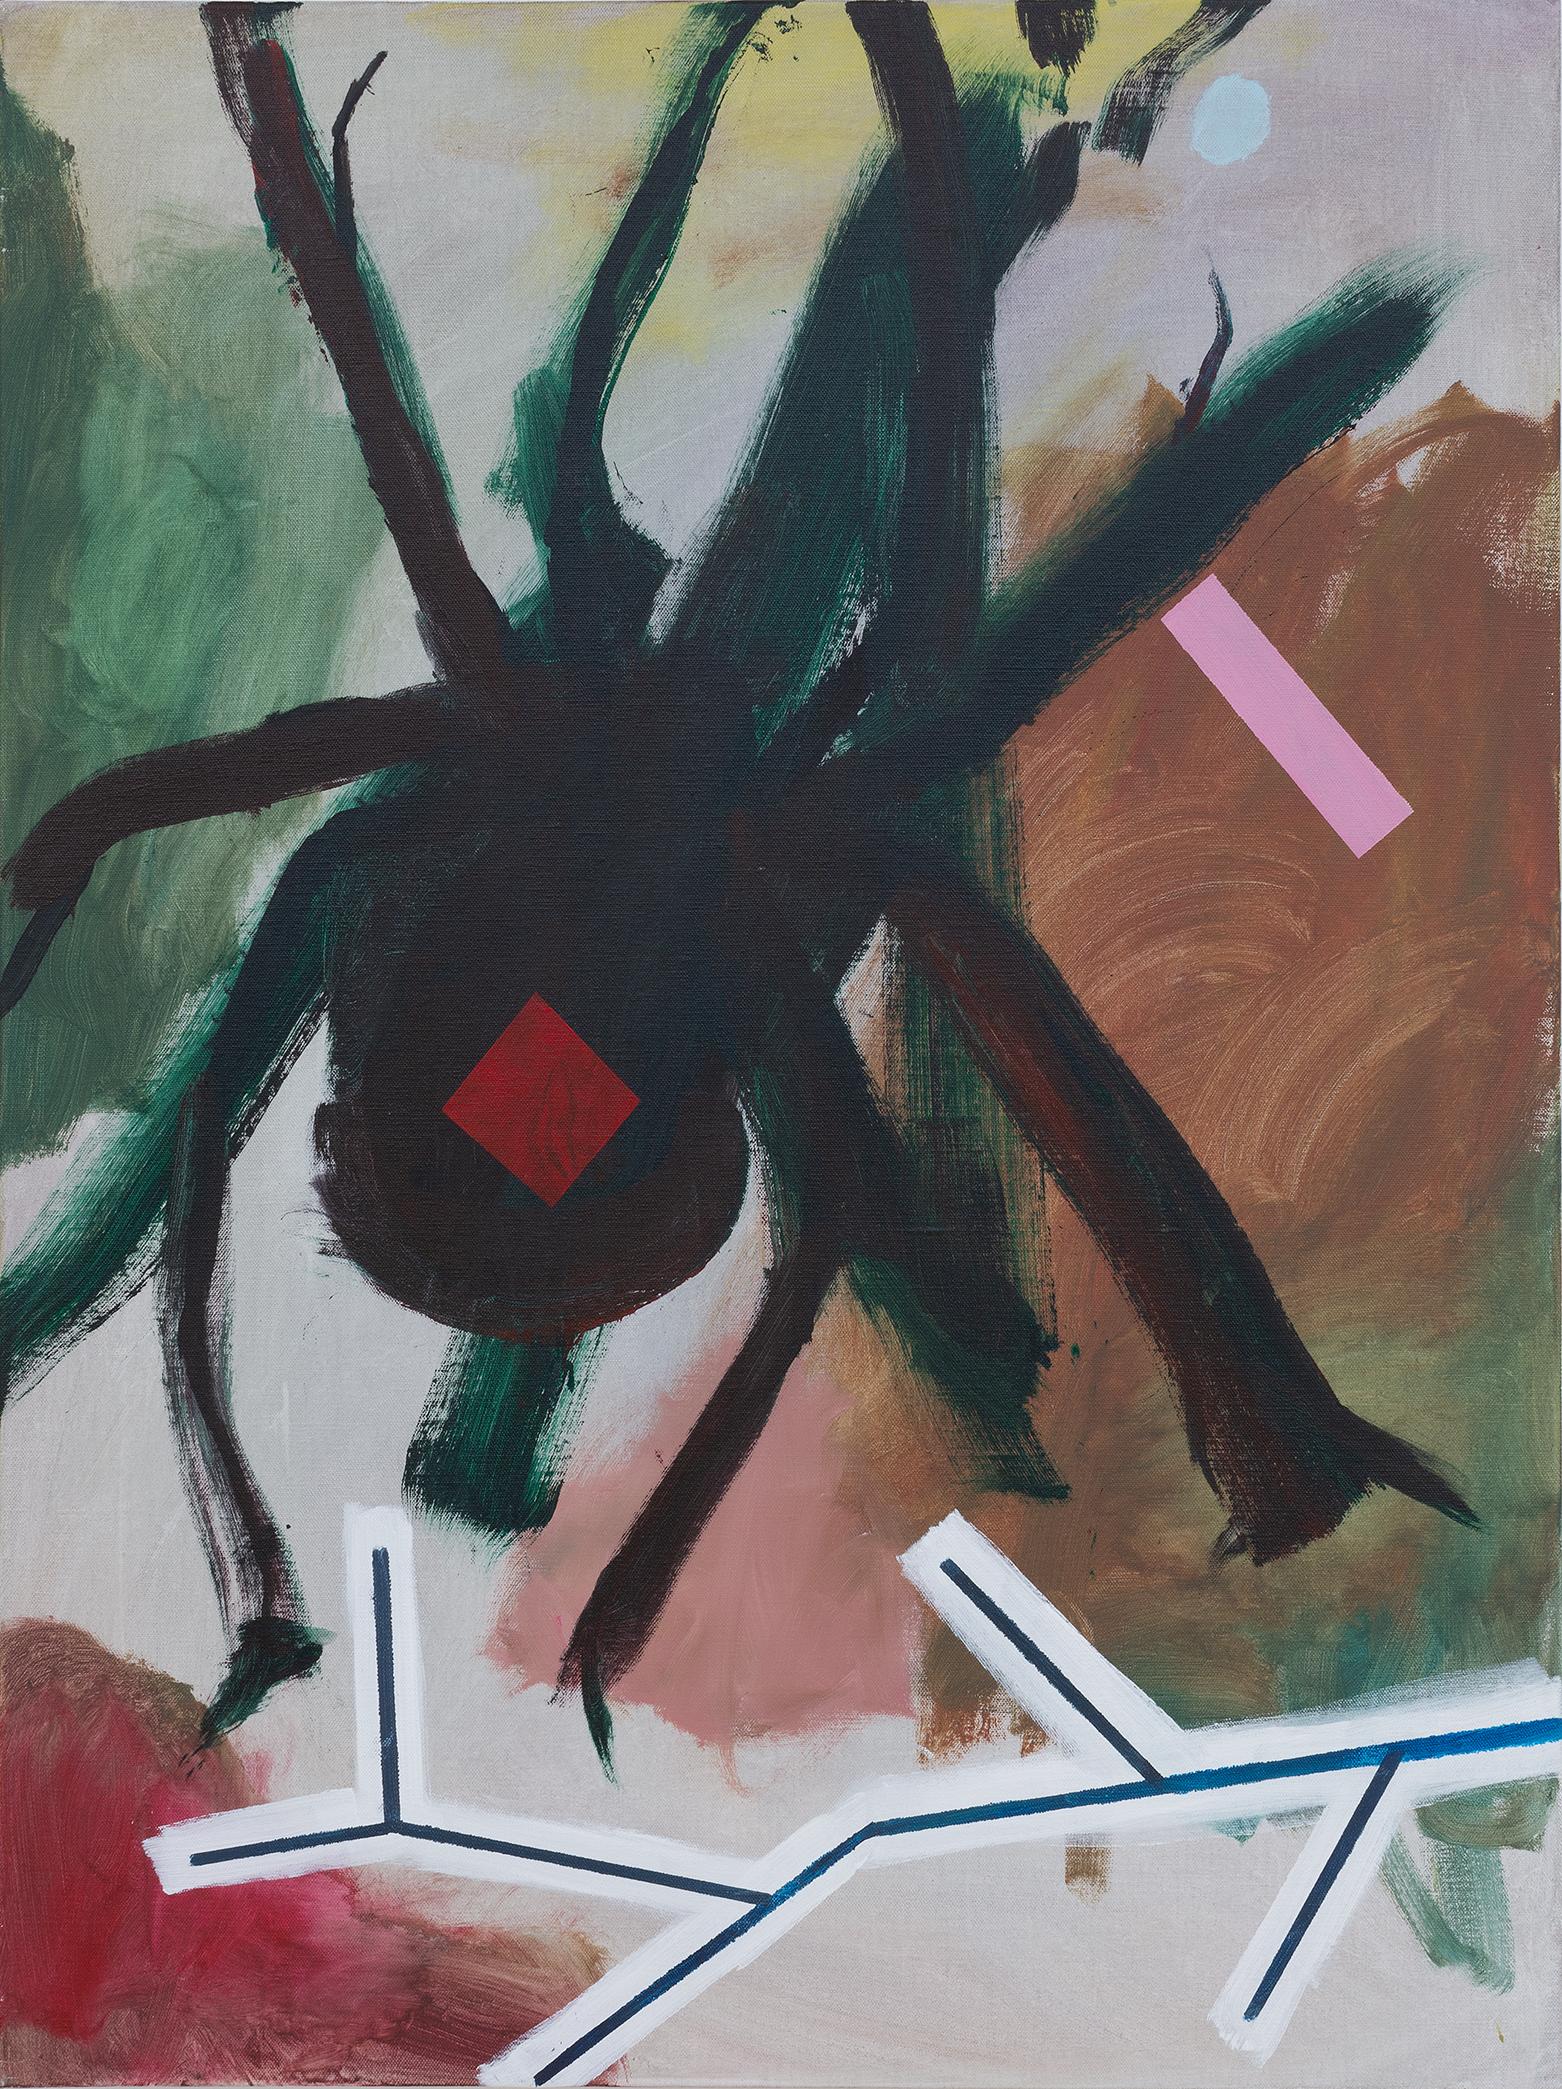 SIMON BLAU  F.Klines'Spider  2018 acrylic on linen 110.5 × 76.5 cm